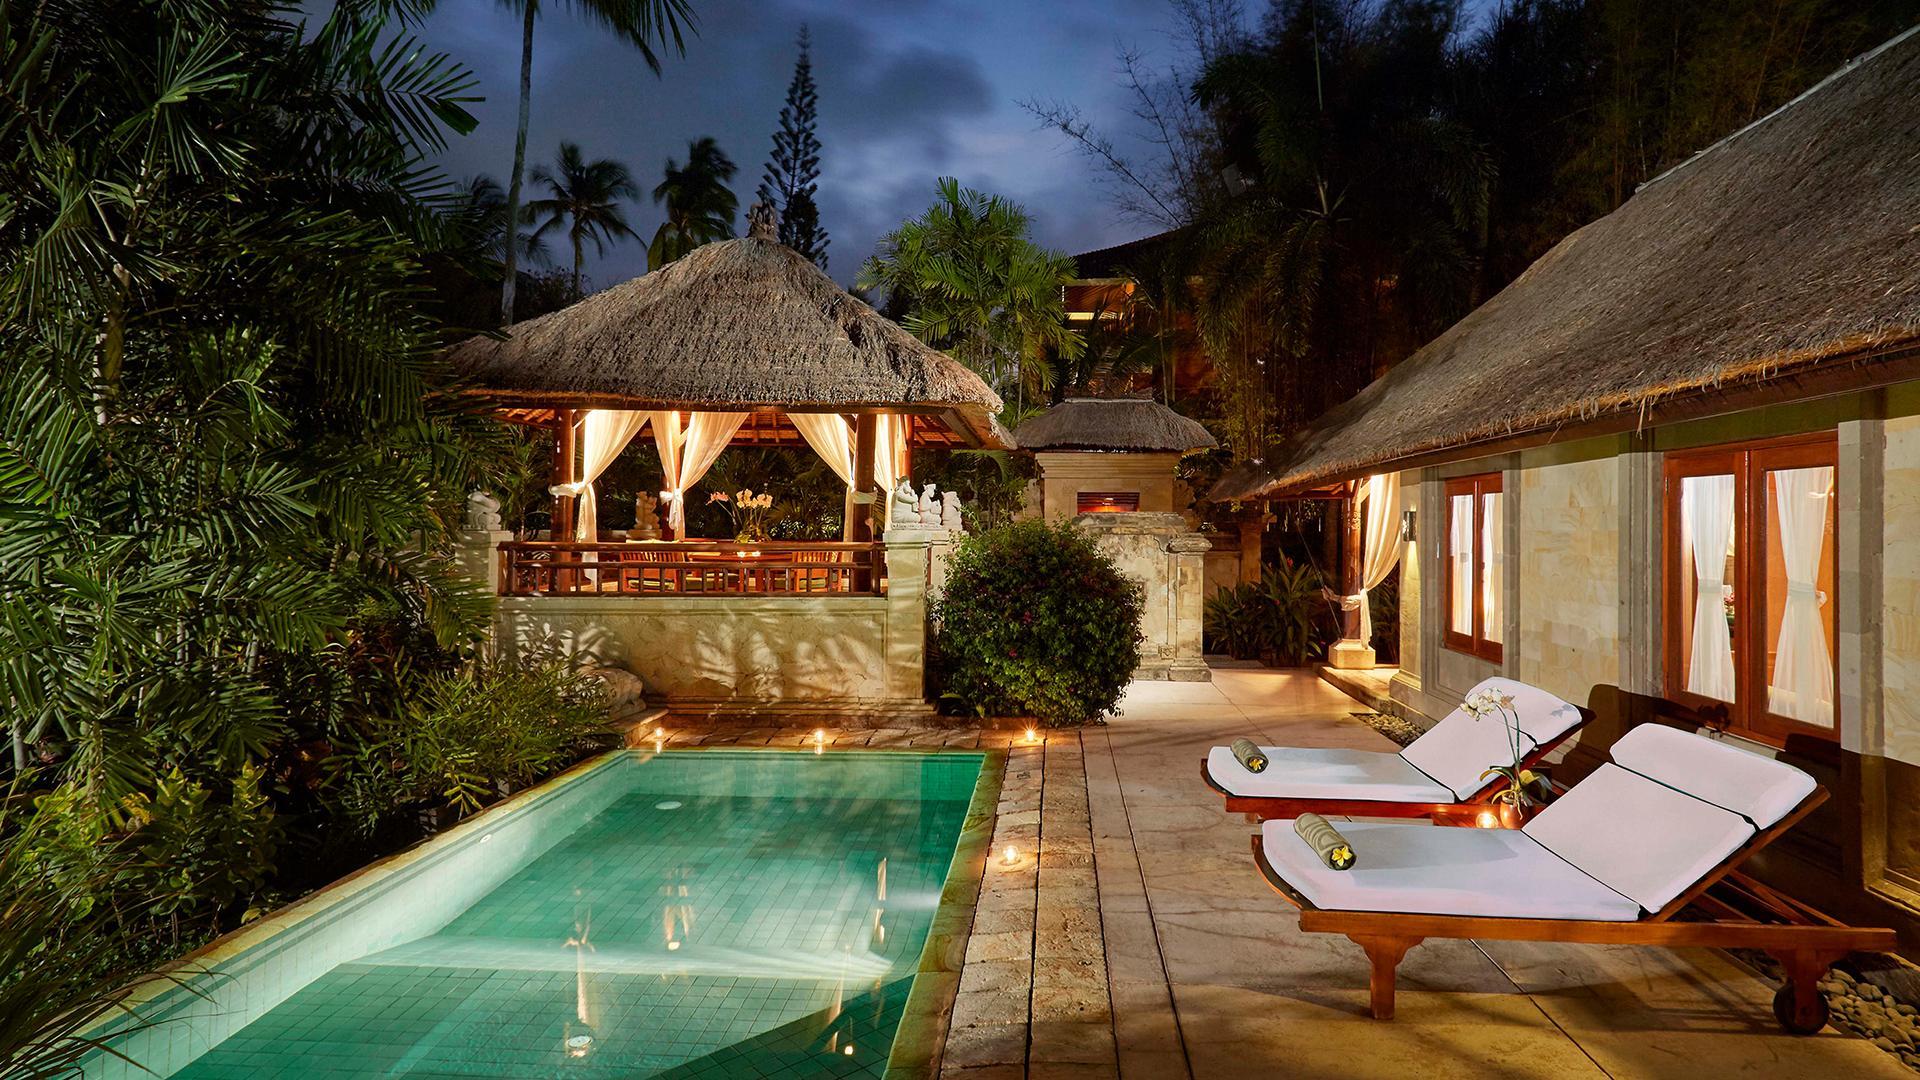 The Level Garden Villa image 1 at Meliá Bali by Kabupaten Badung, Bali, Indonesia